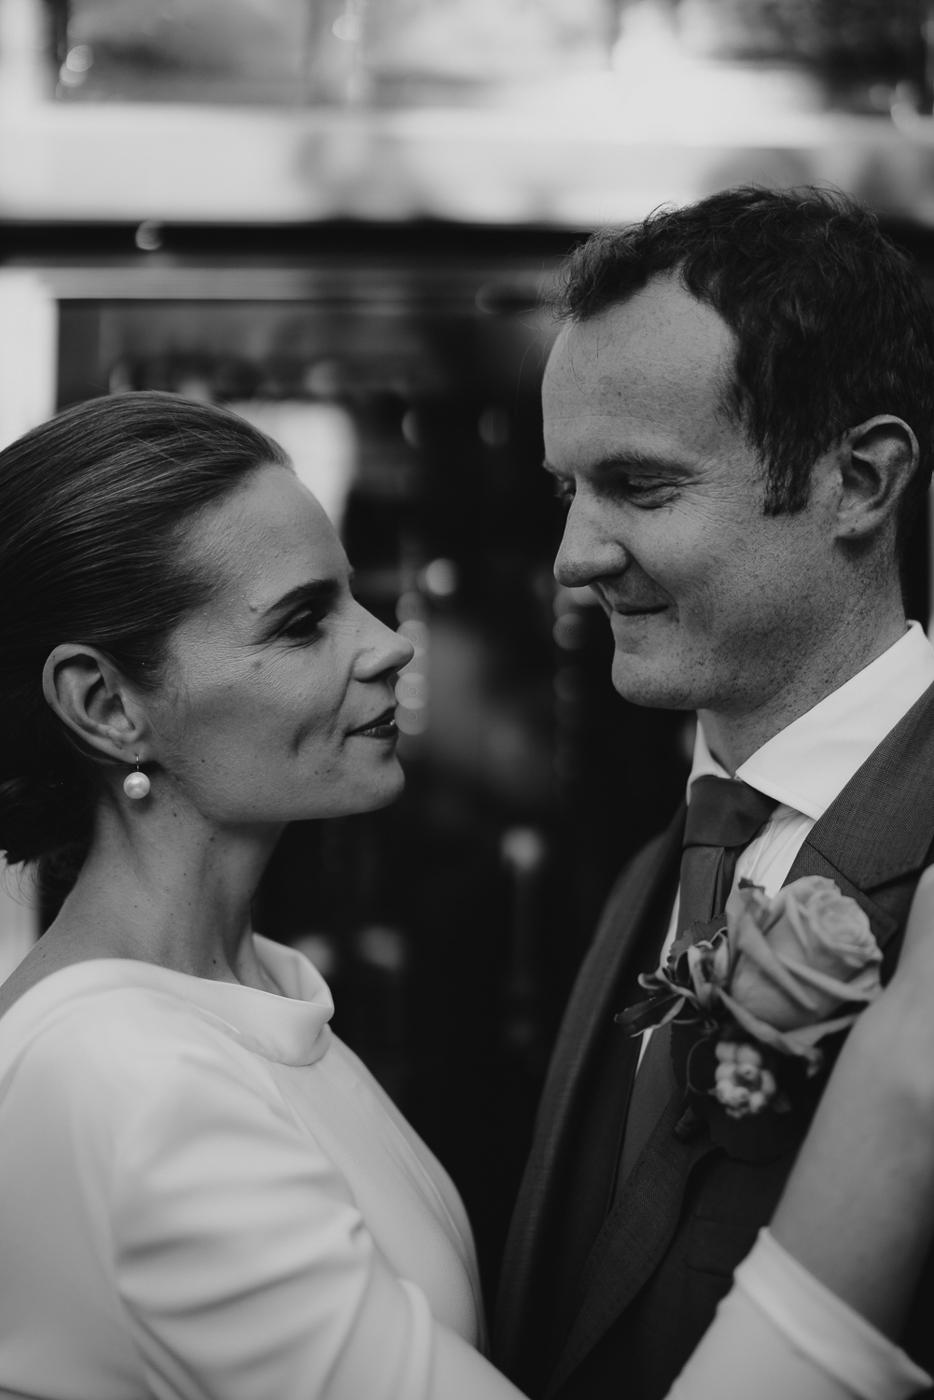 bruidsfotografie-trouwfotograaf-wedding-photographer-amsterdam-James-Jantine-247-2.jpg